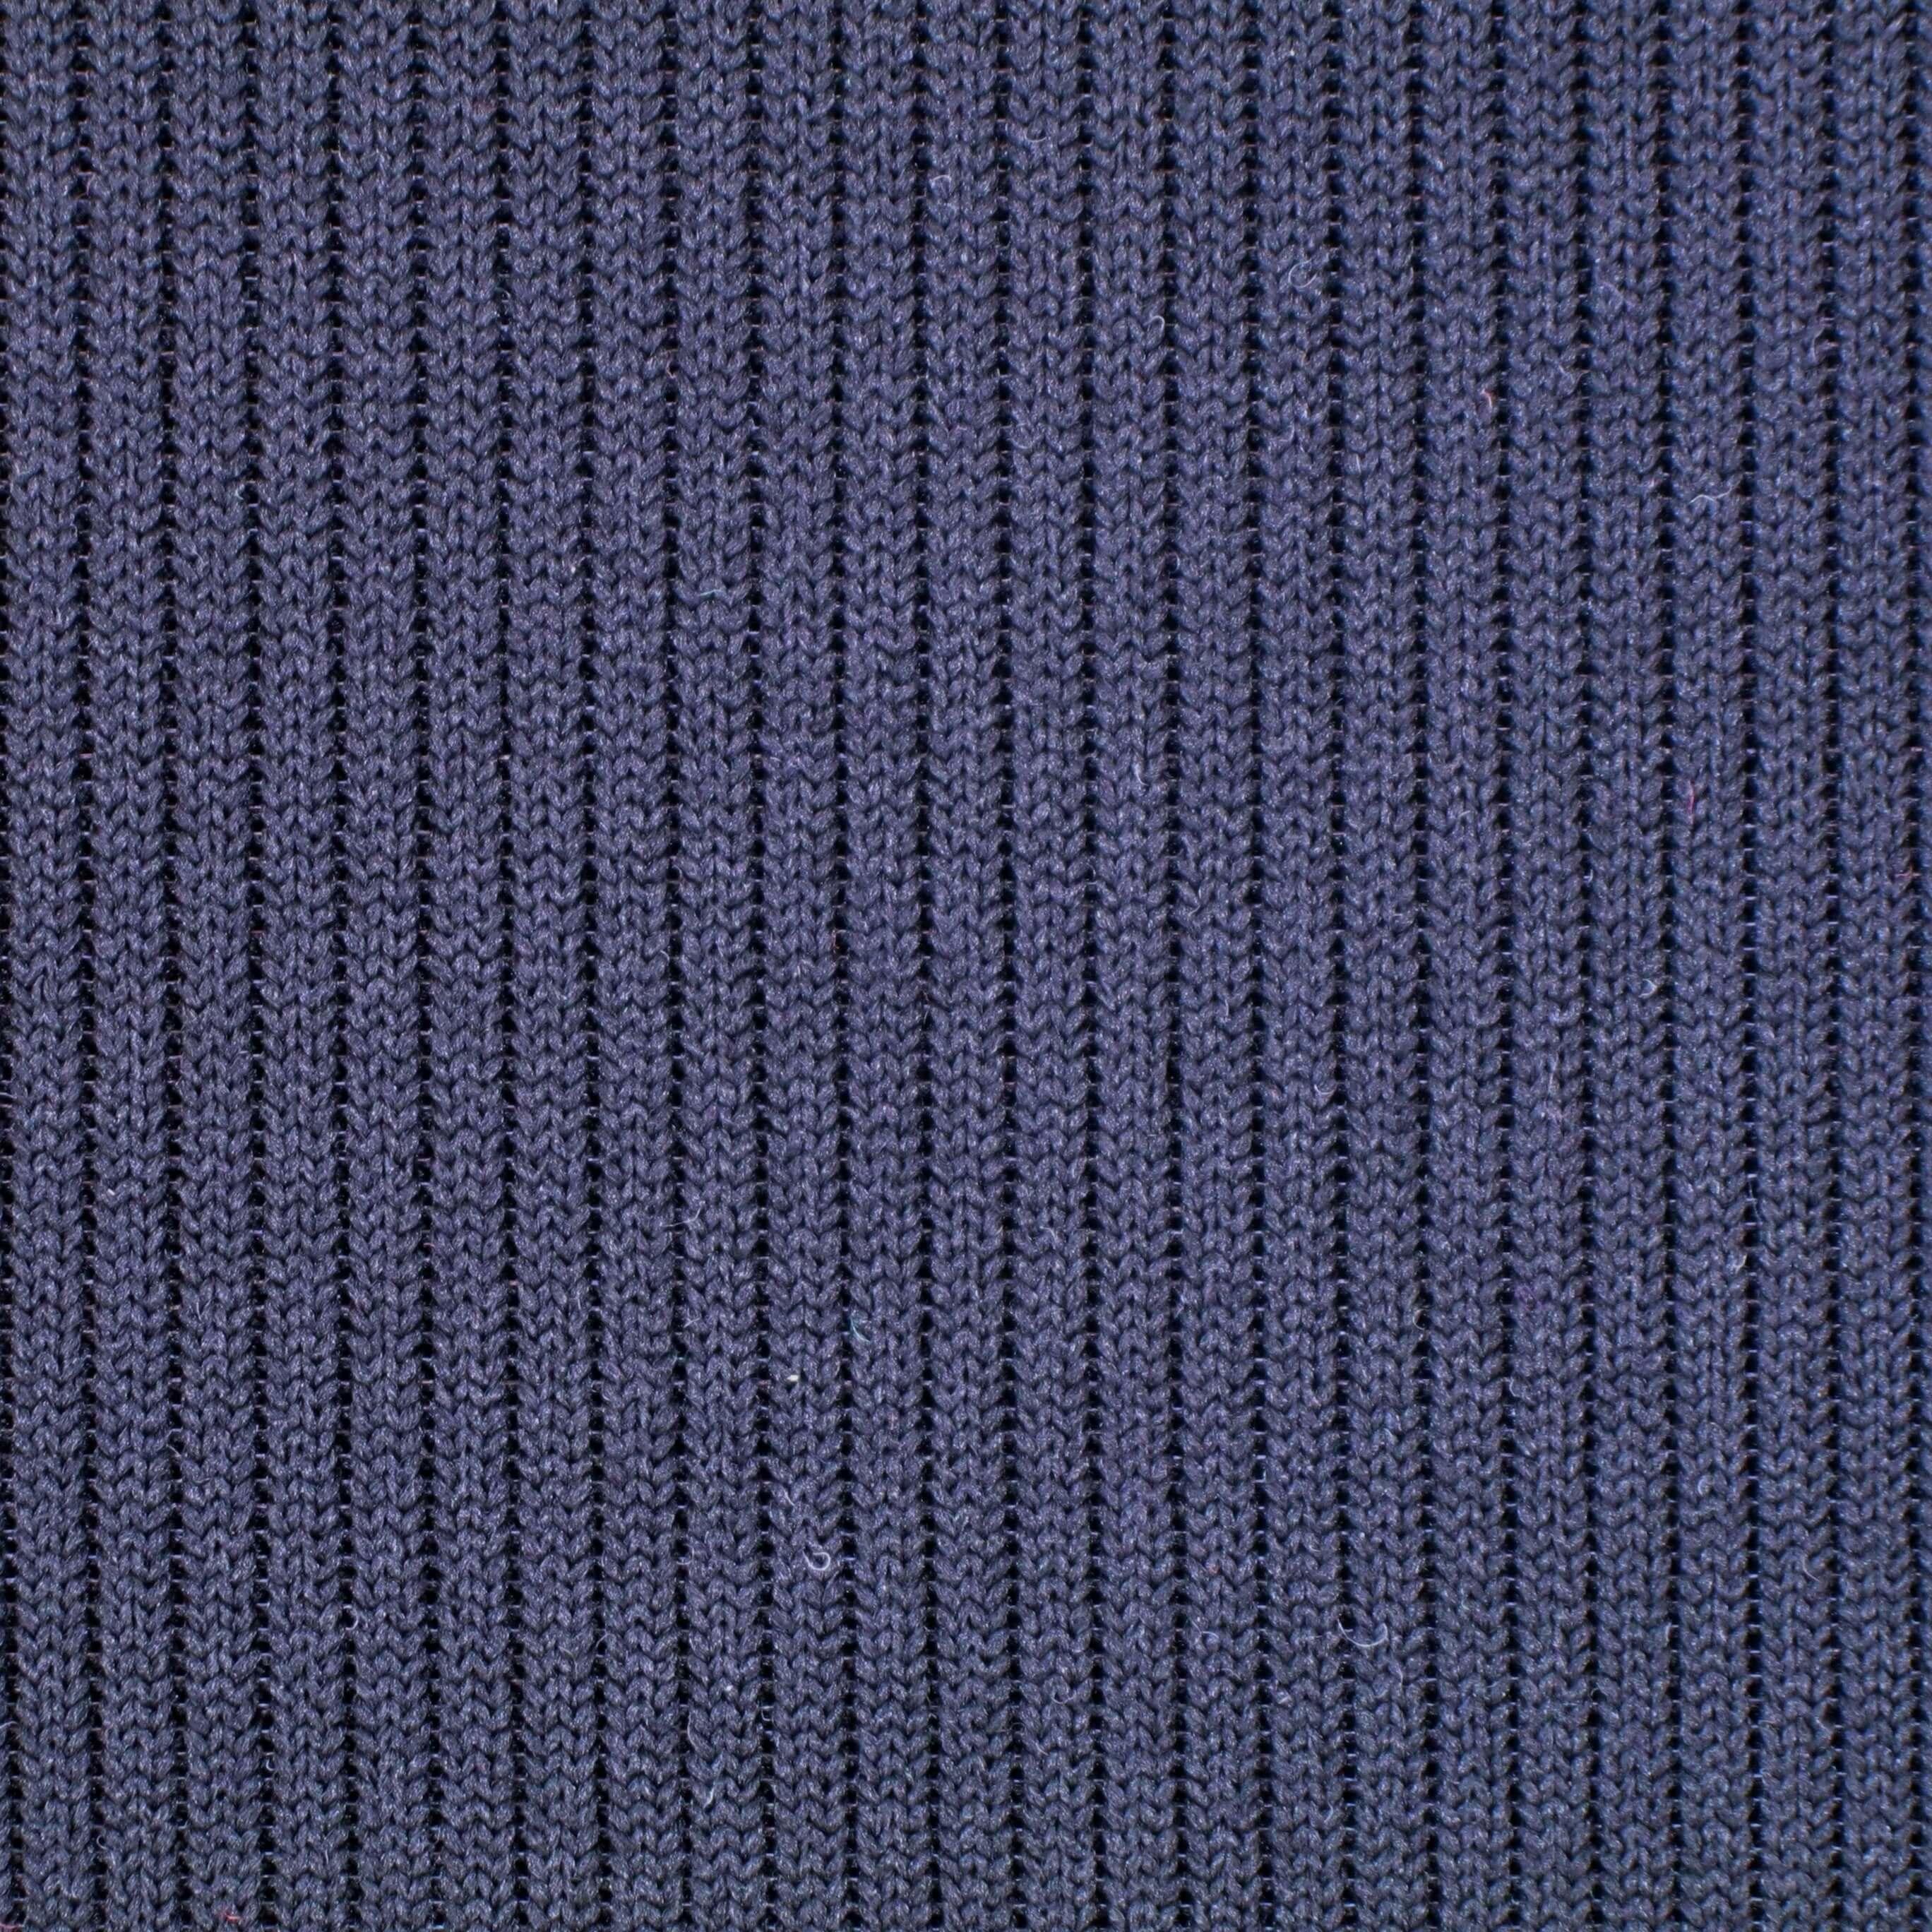 96 Polyester 4 Spandex 2x2 RIB Knitted Fabric EYSAN FABRICS